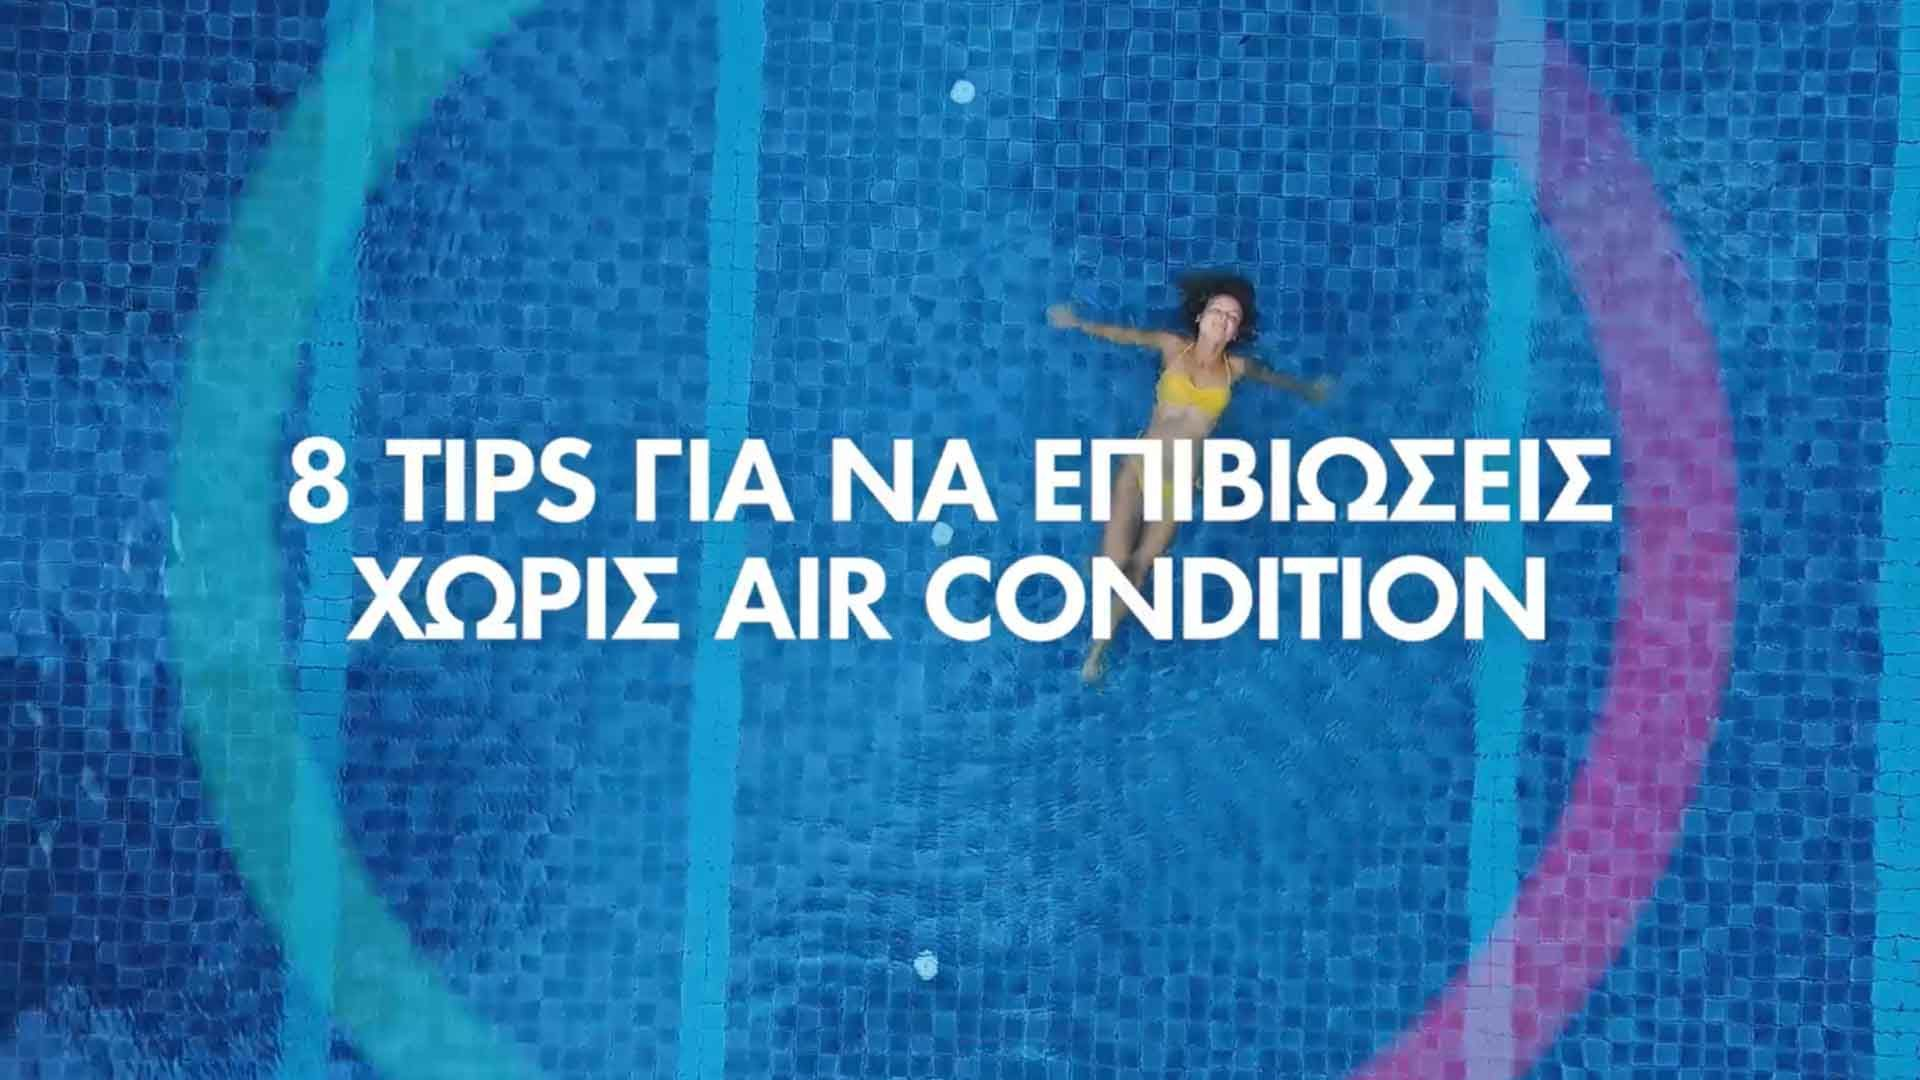 8 Tips για να επιβιώσεις χωρίς Air Condition